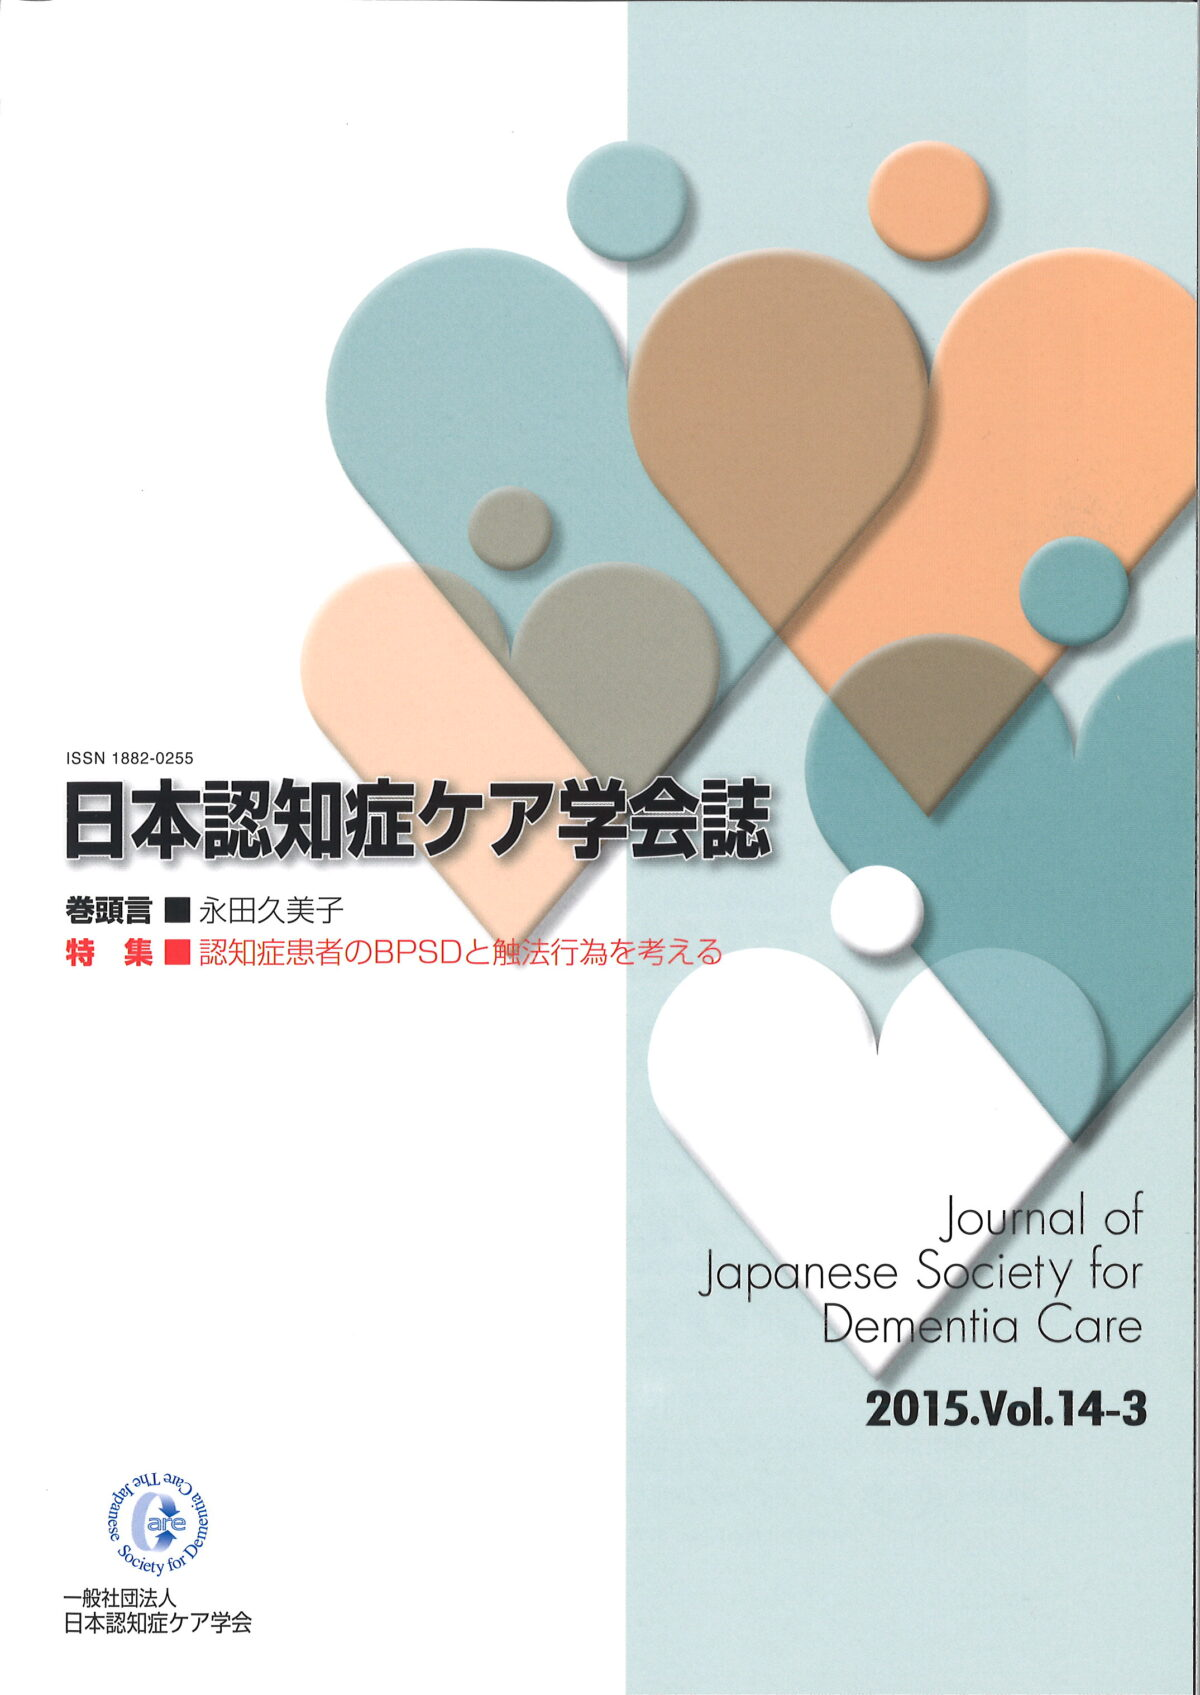 「特養の重介護施設化と倫理的課題」